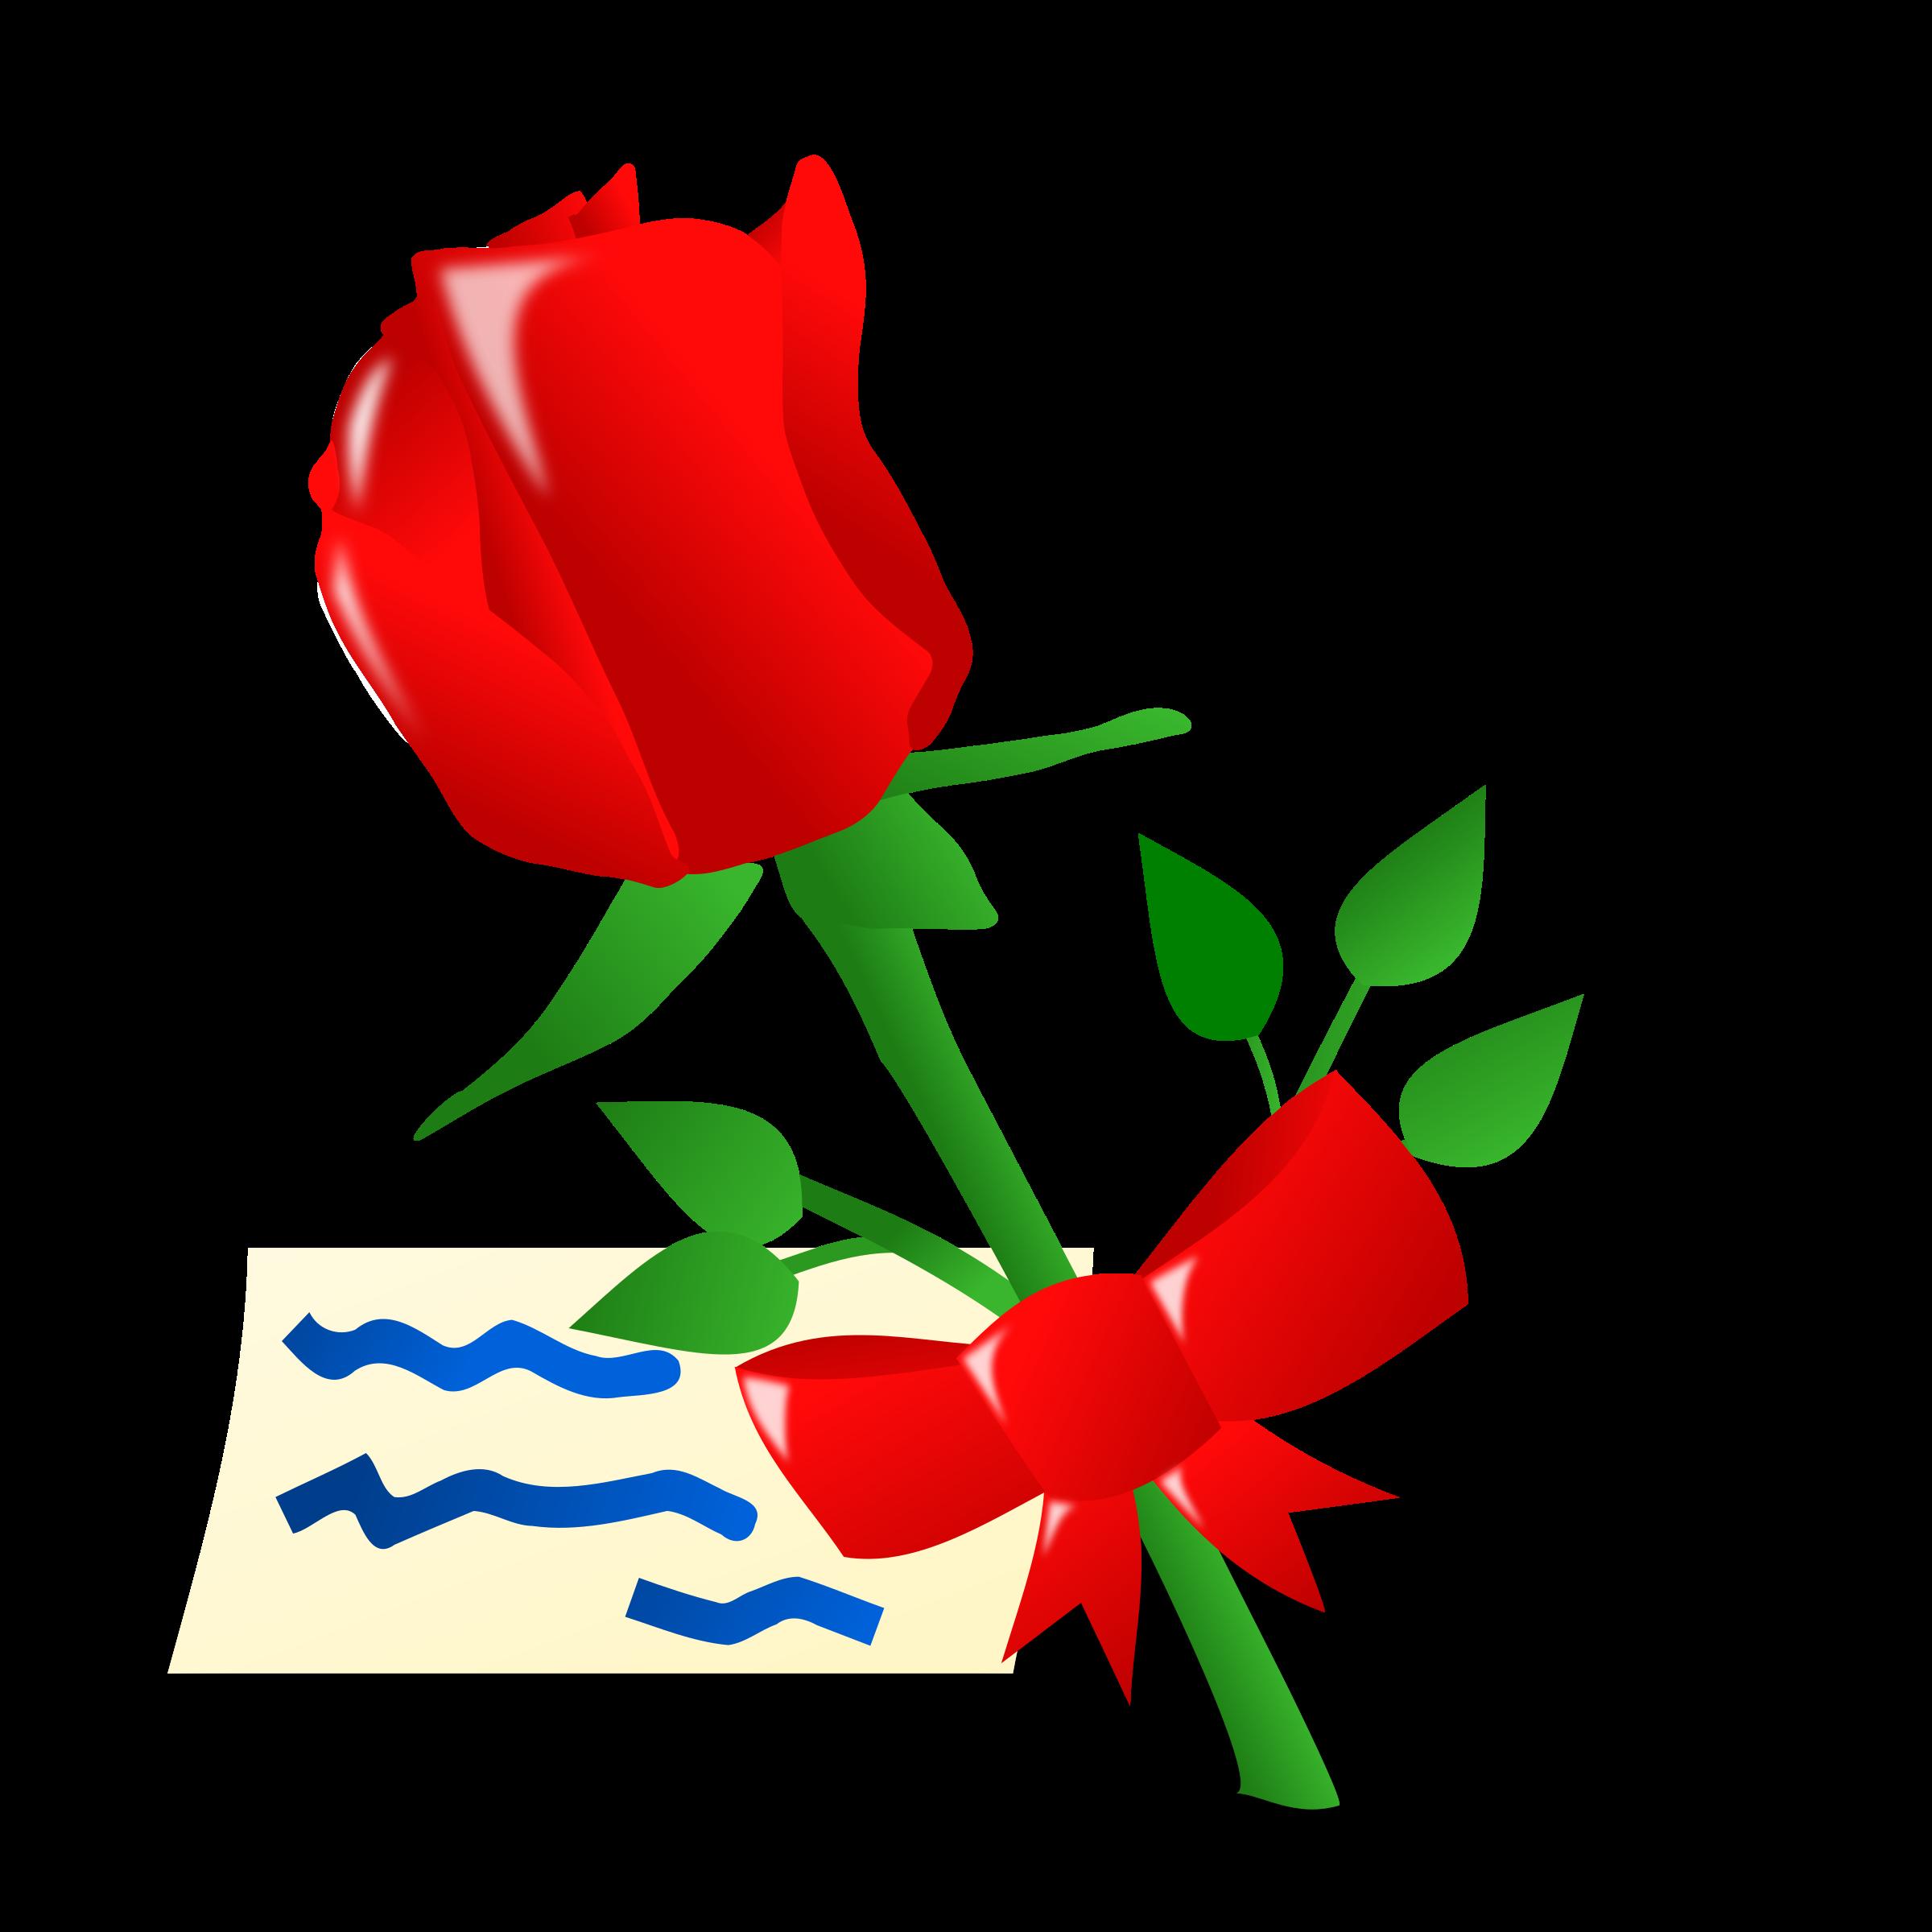 Clipart roses valentines. Valentine day icon big